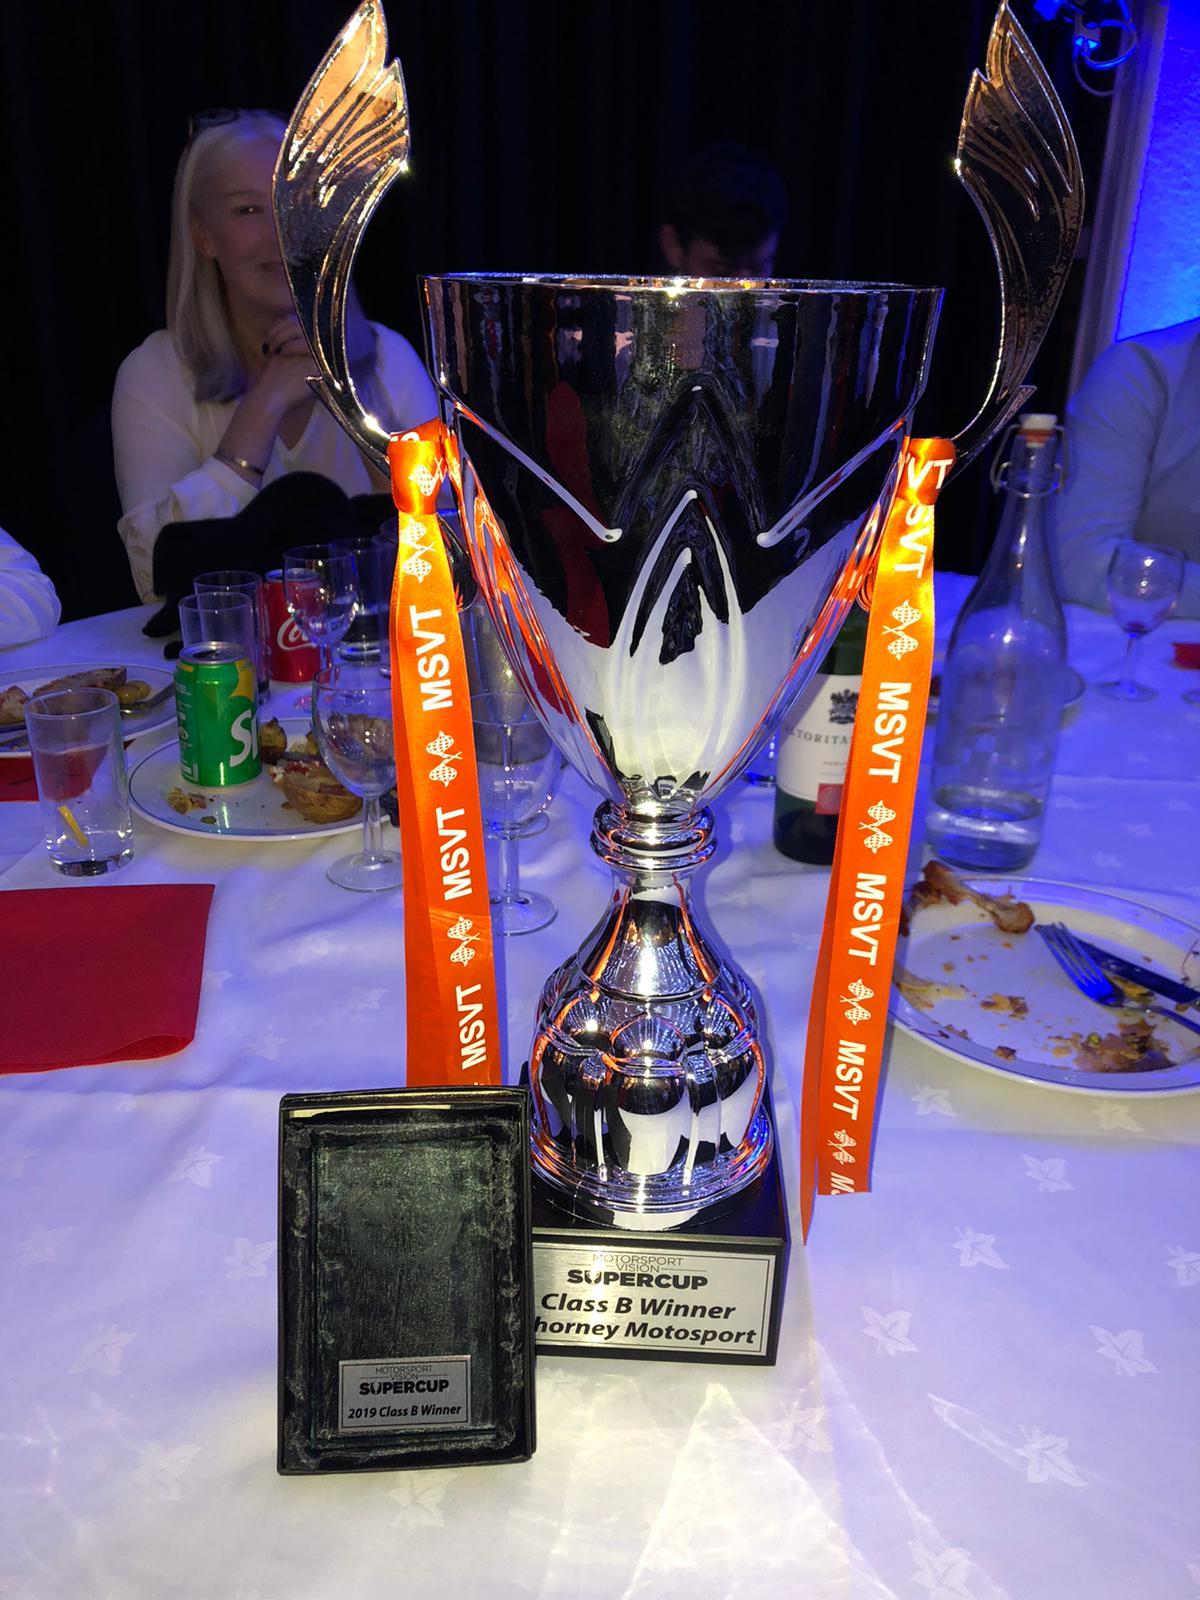 Callum Noble, Class B MSV Supercup Champion